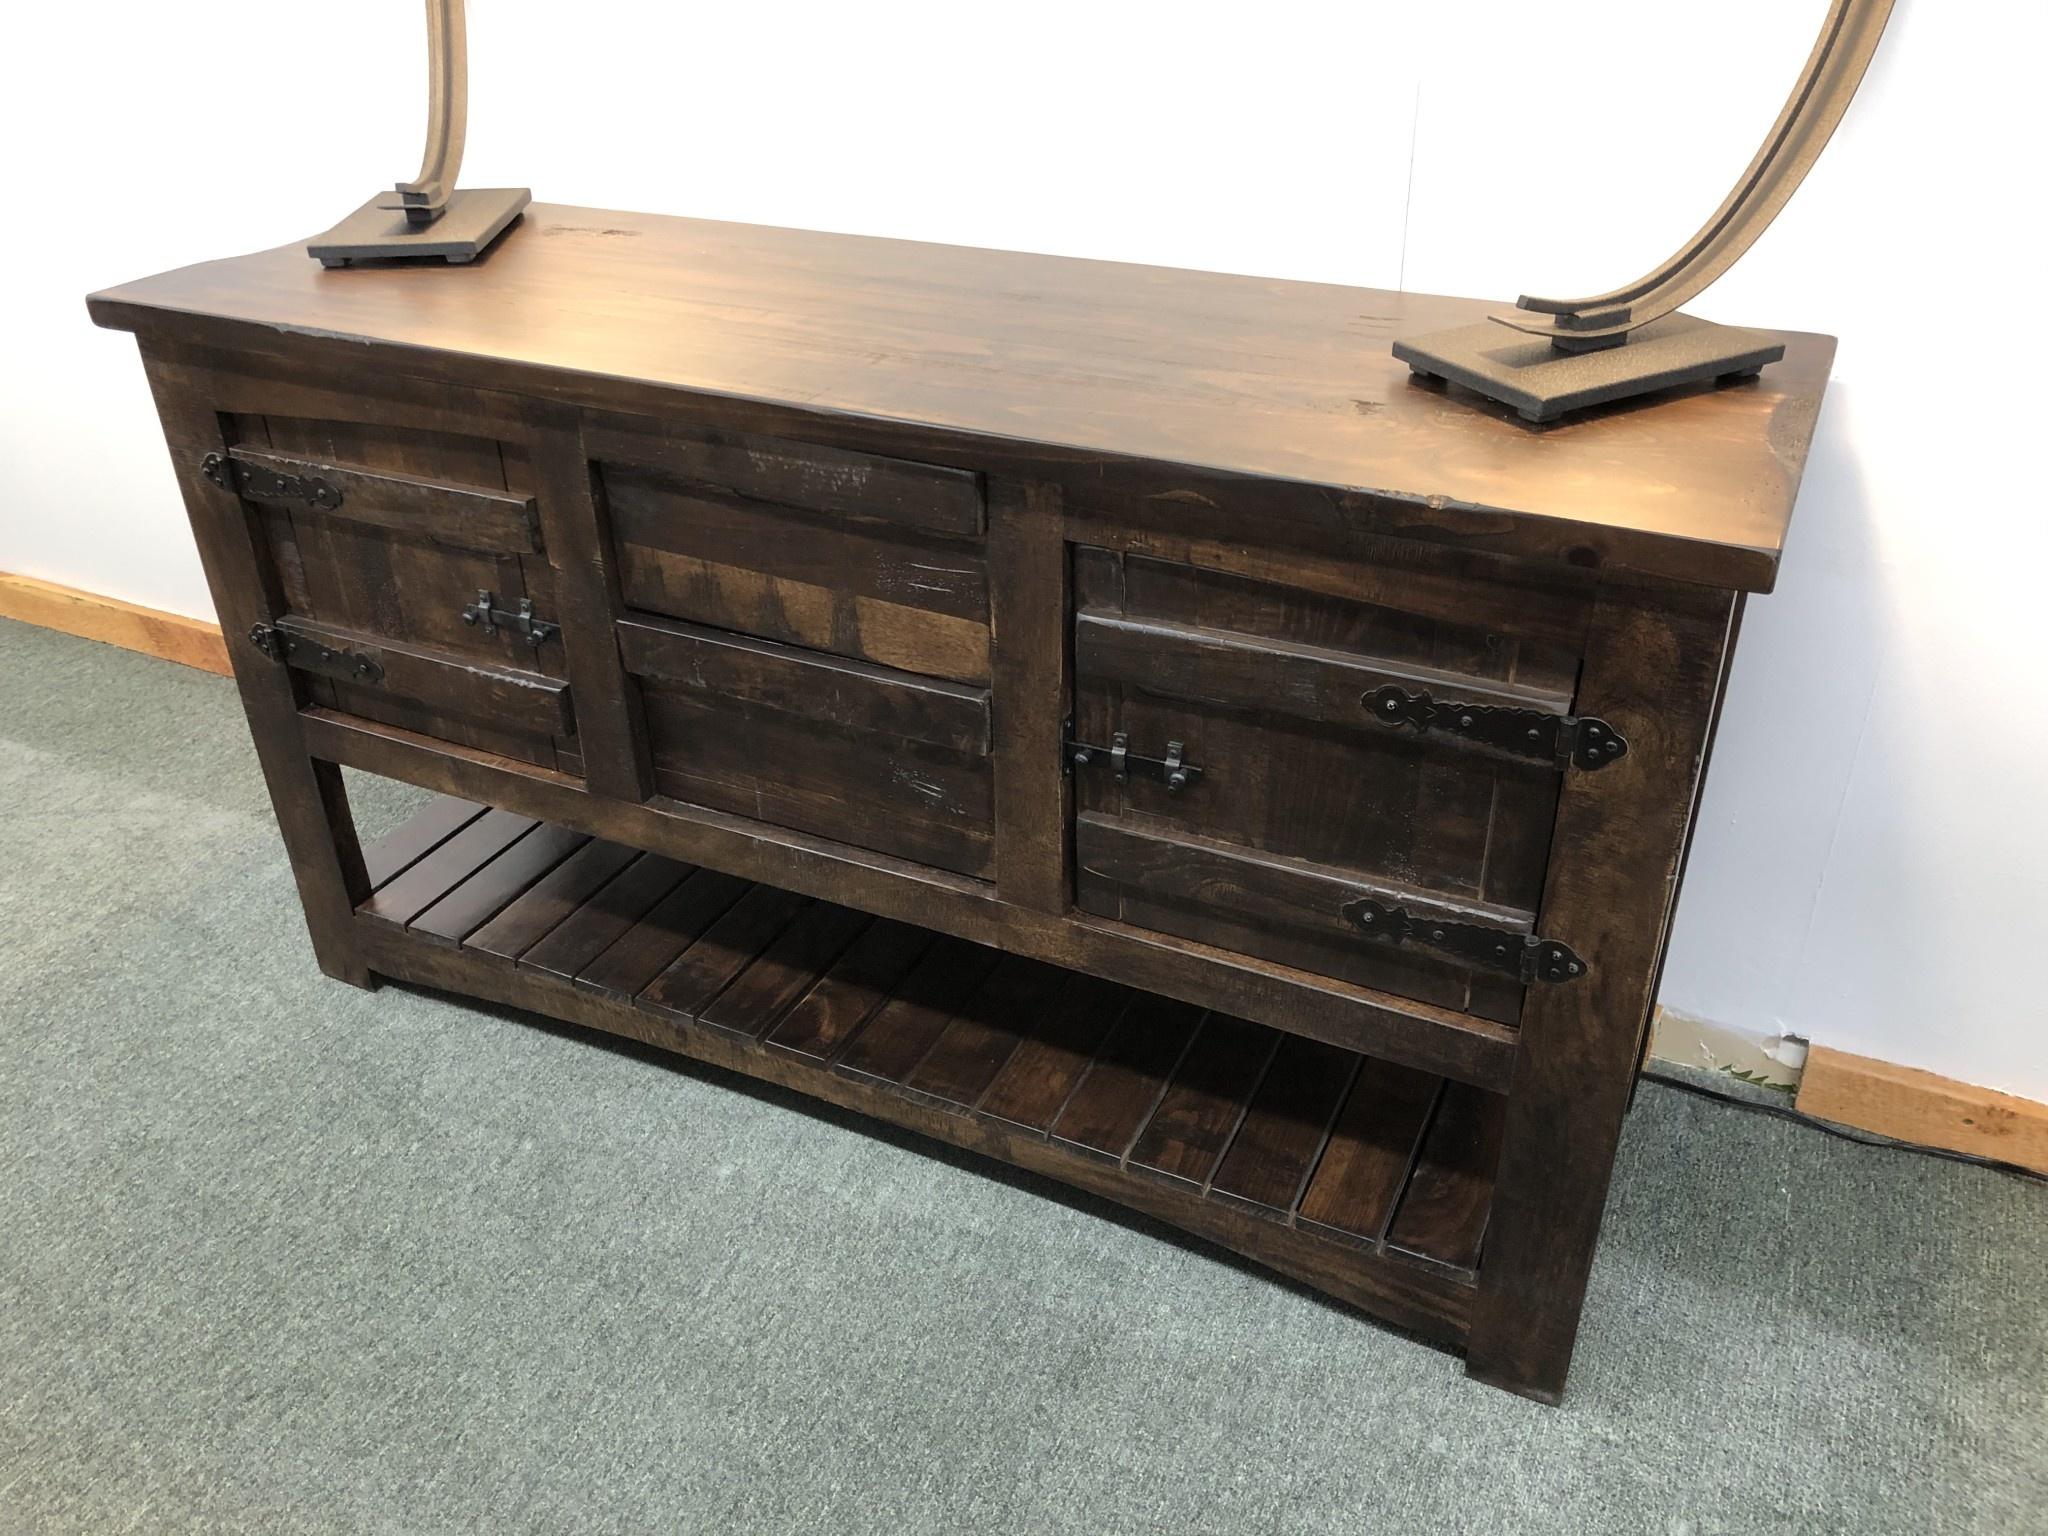 Ifd 567 Sofa Table W 2 Drawers Doors